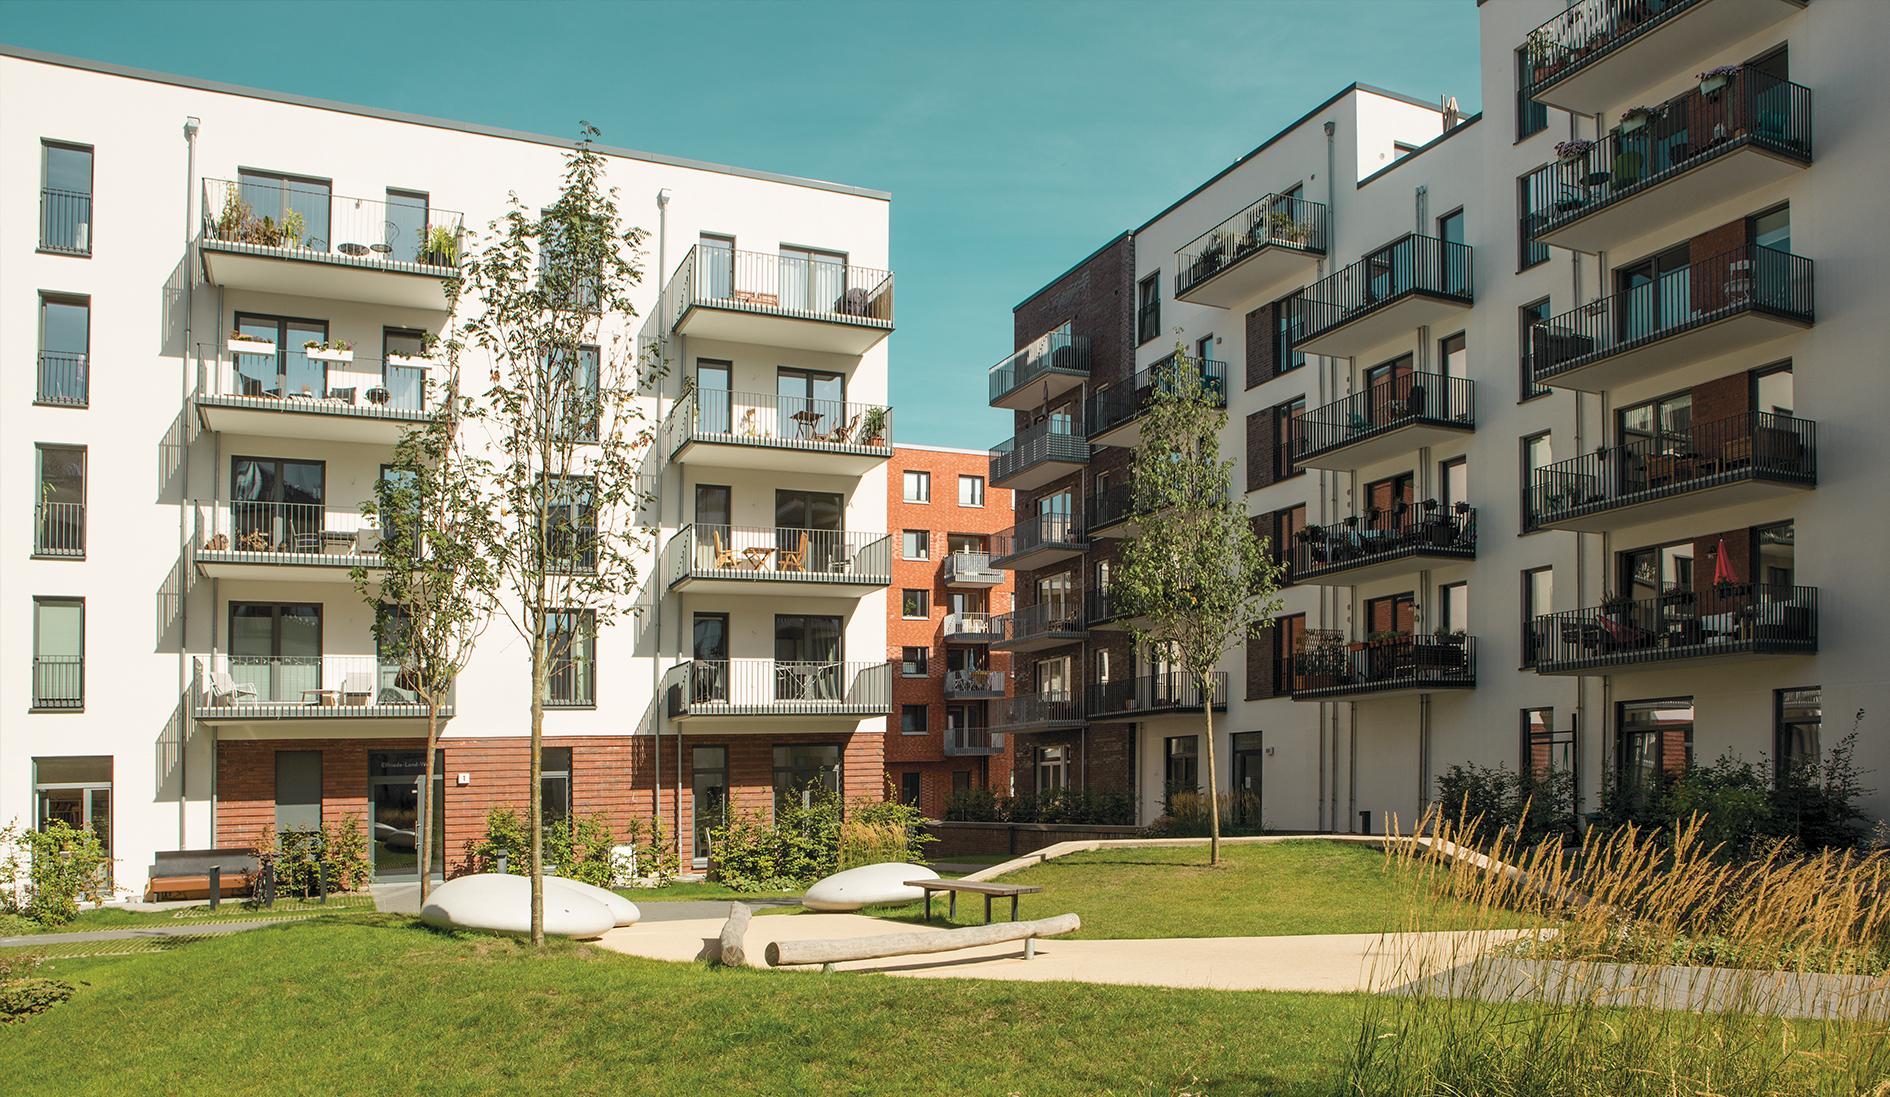 291_Mitte-Altona_Südhof